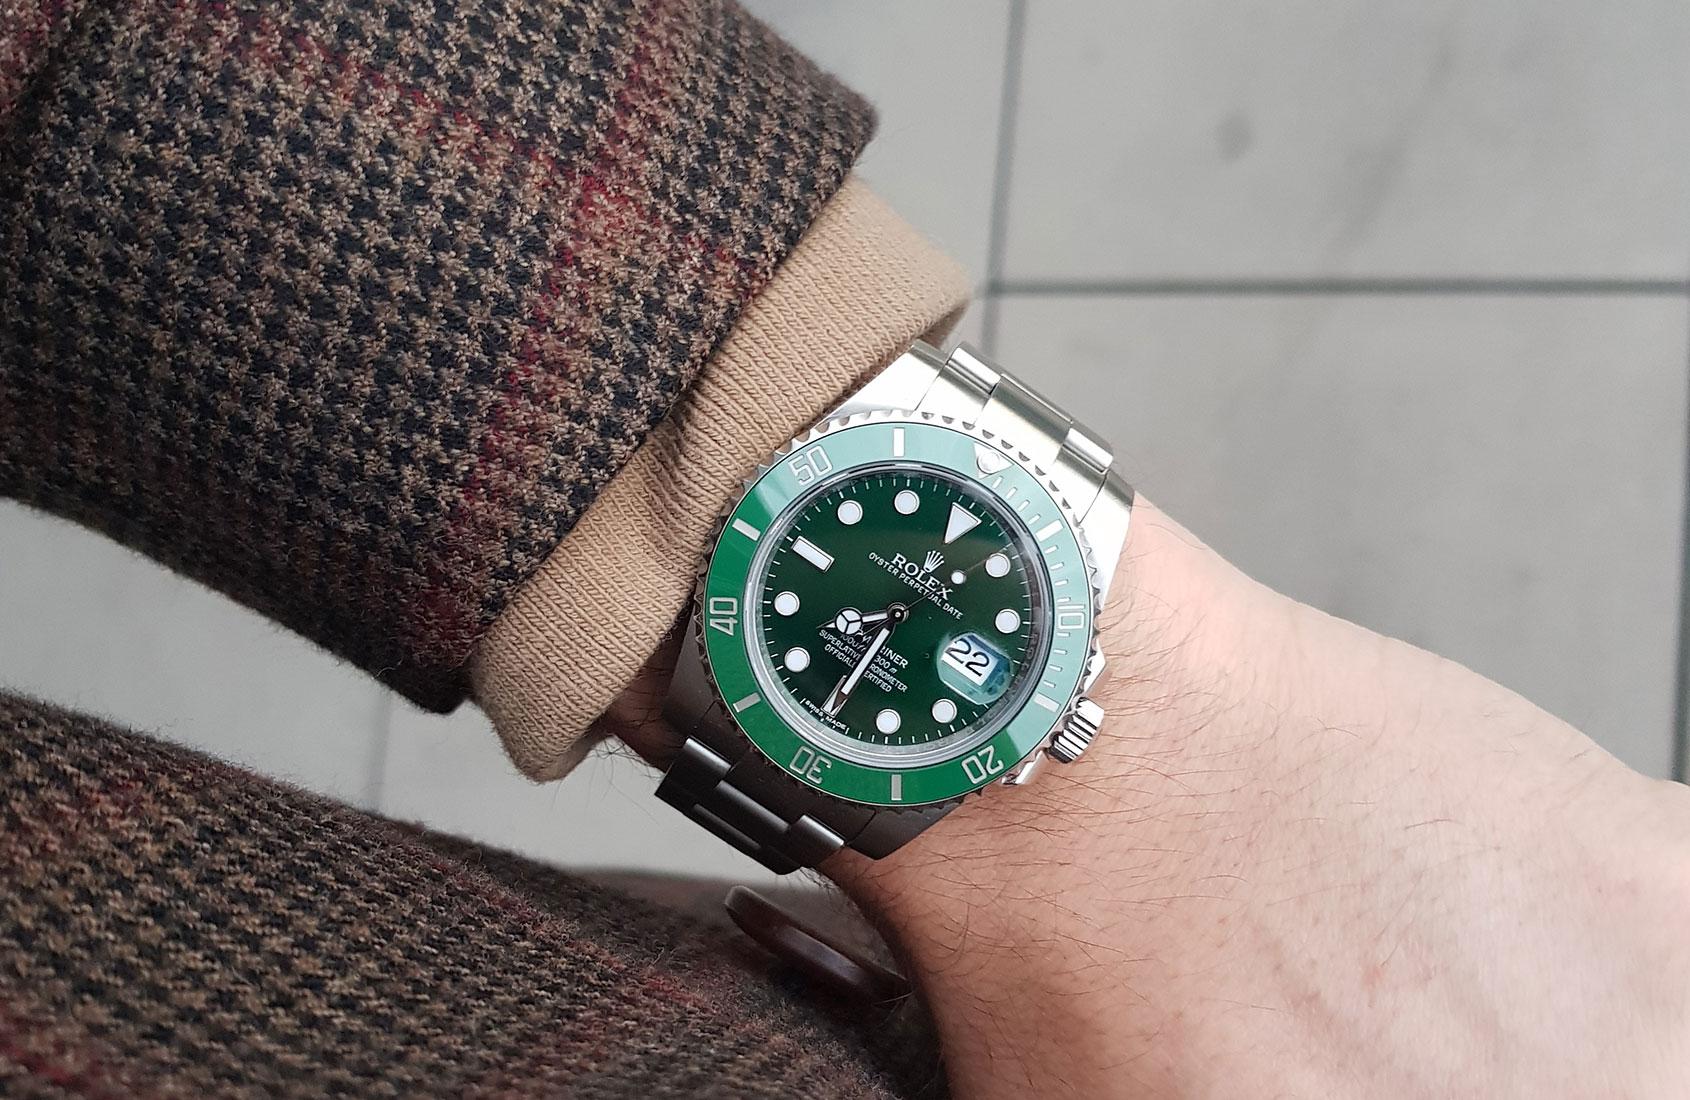 Rolex Submariner 116610lv Aka The Hulk Year Long Review